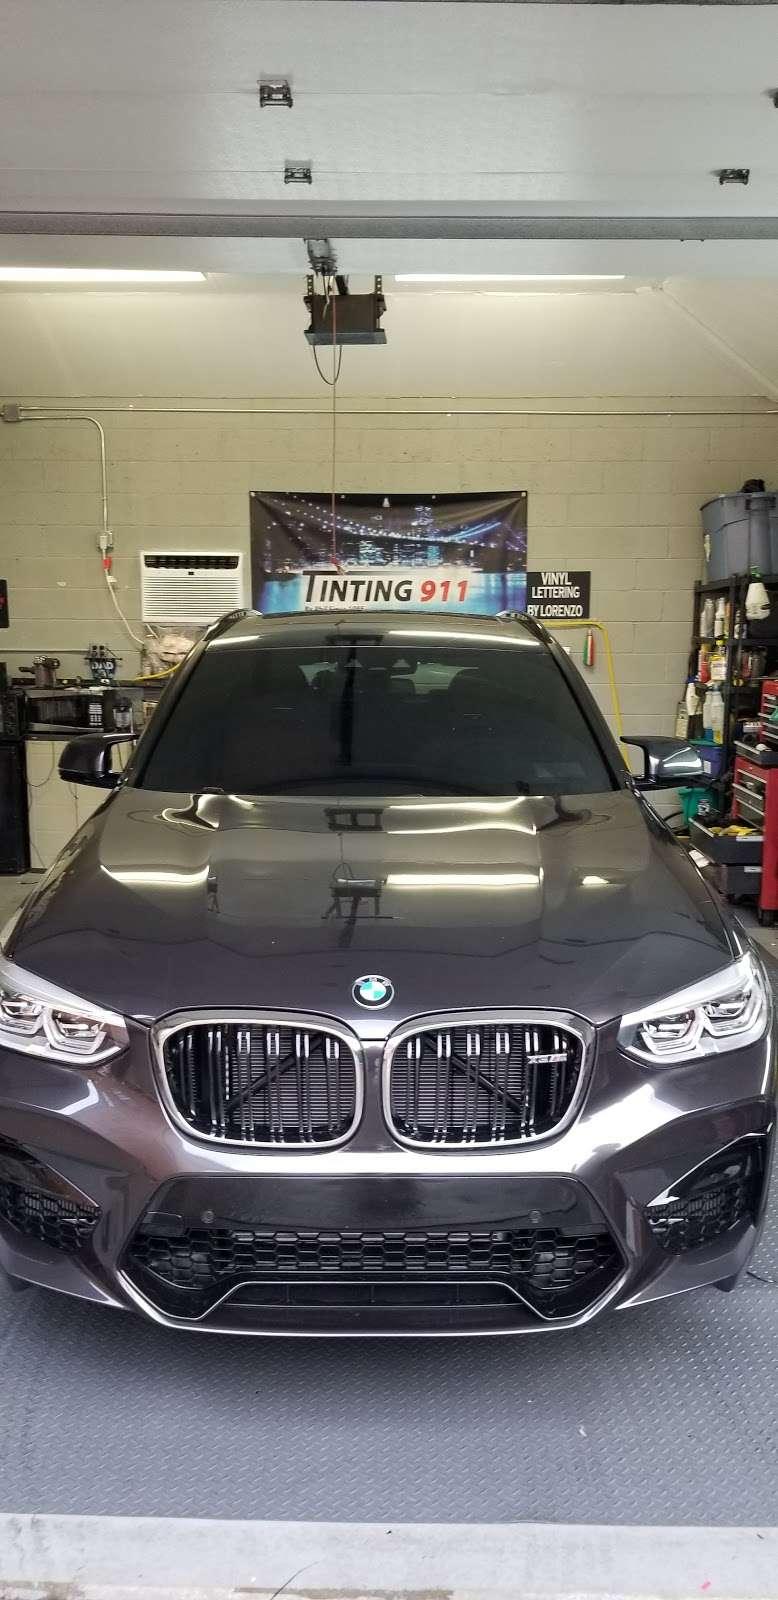 Tinting 911 - car repair  | Photo 10 of 10 | Address: 150-36 17th Ave, Whitestone, NY 11357, USA | Phone: (718) 229-8468